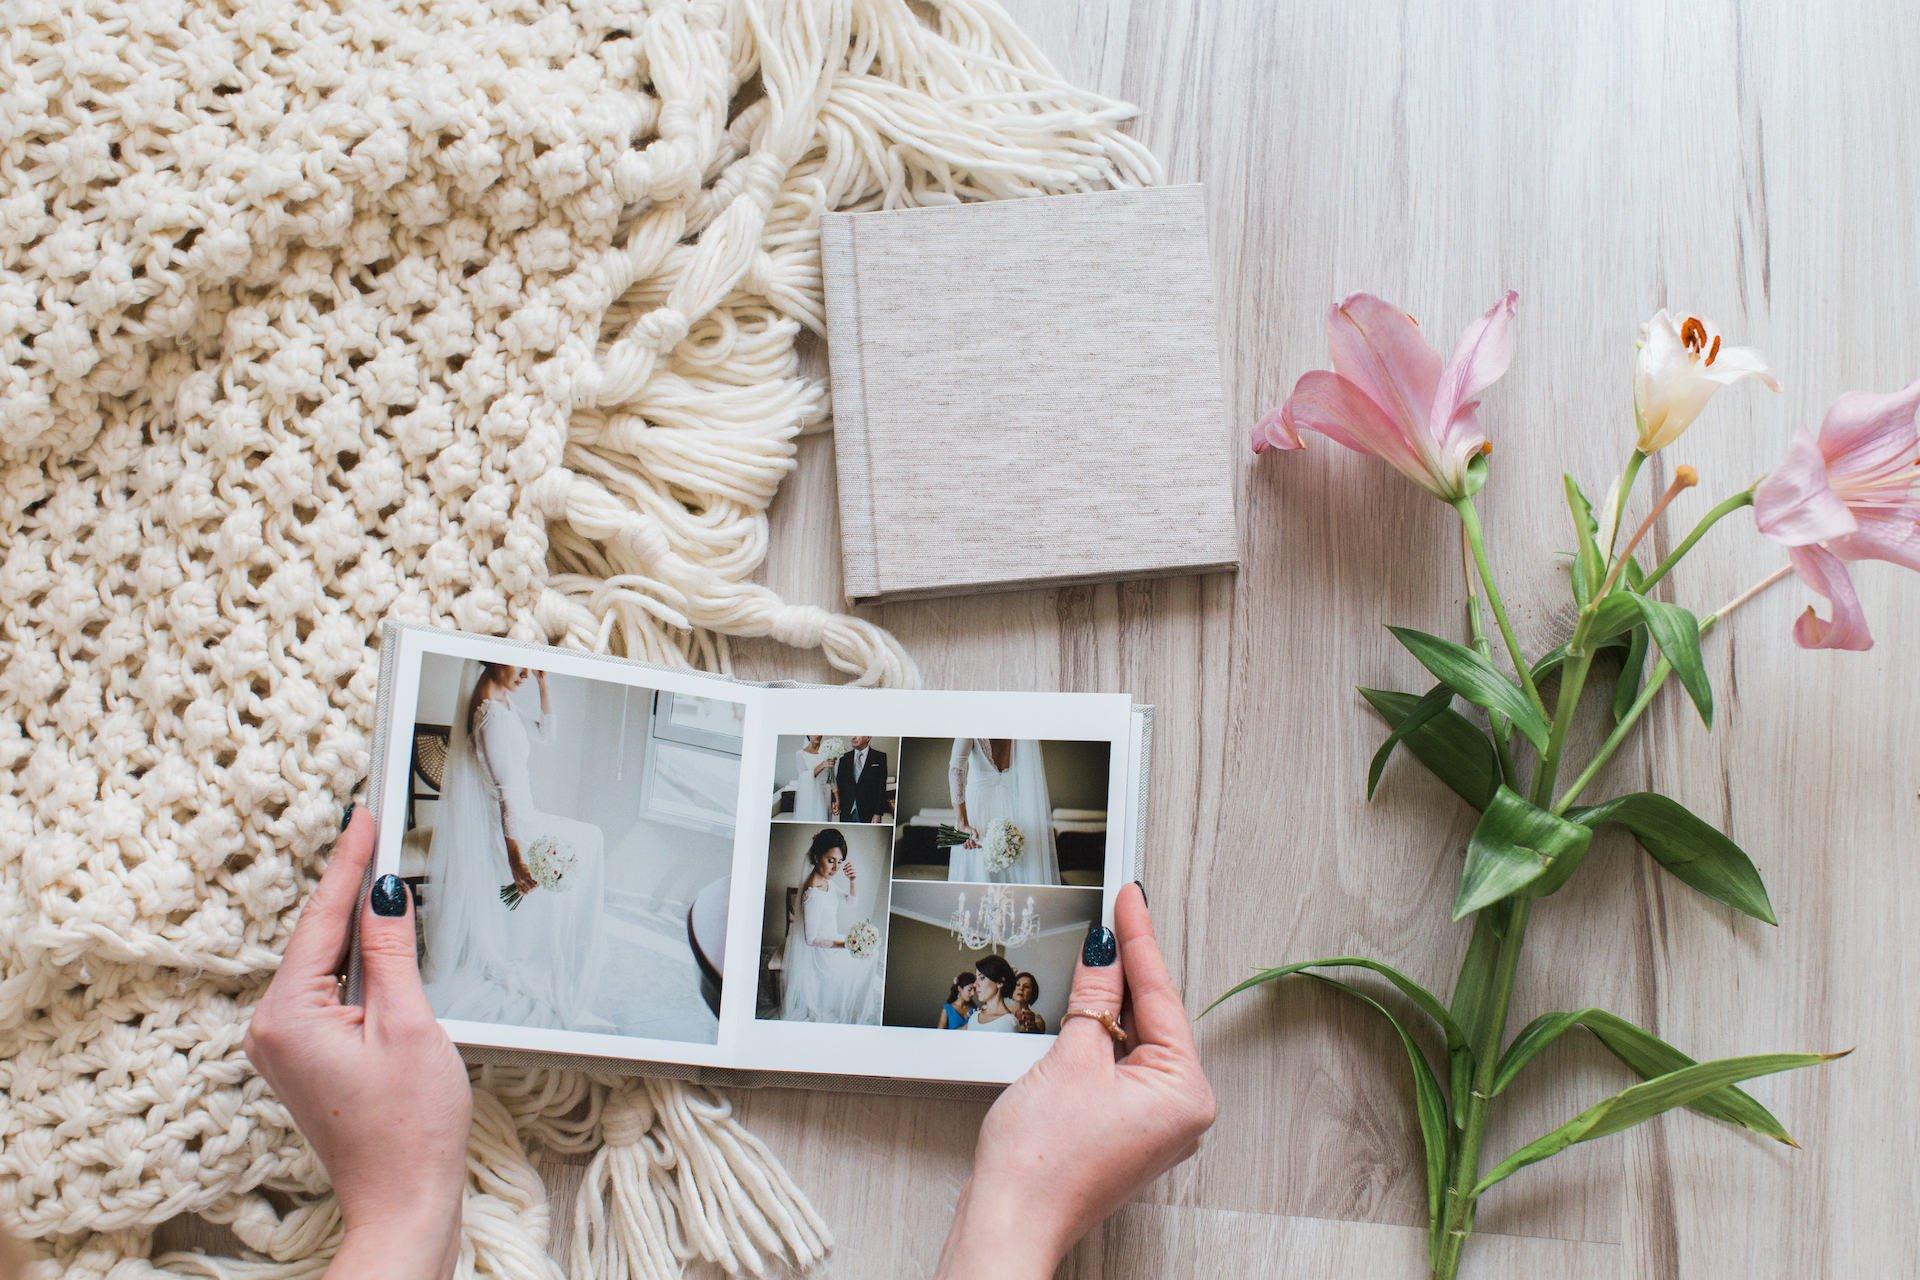 Wedding-Photography-Album-2 15